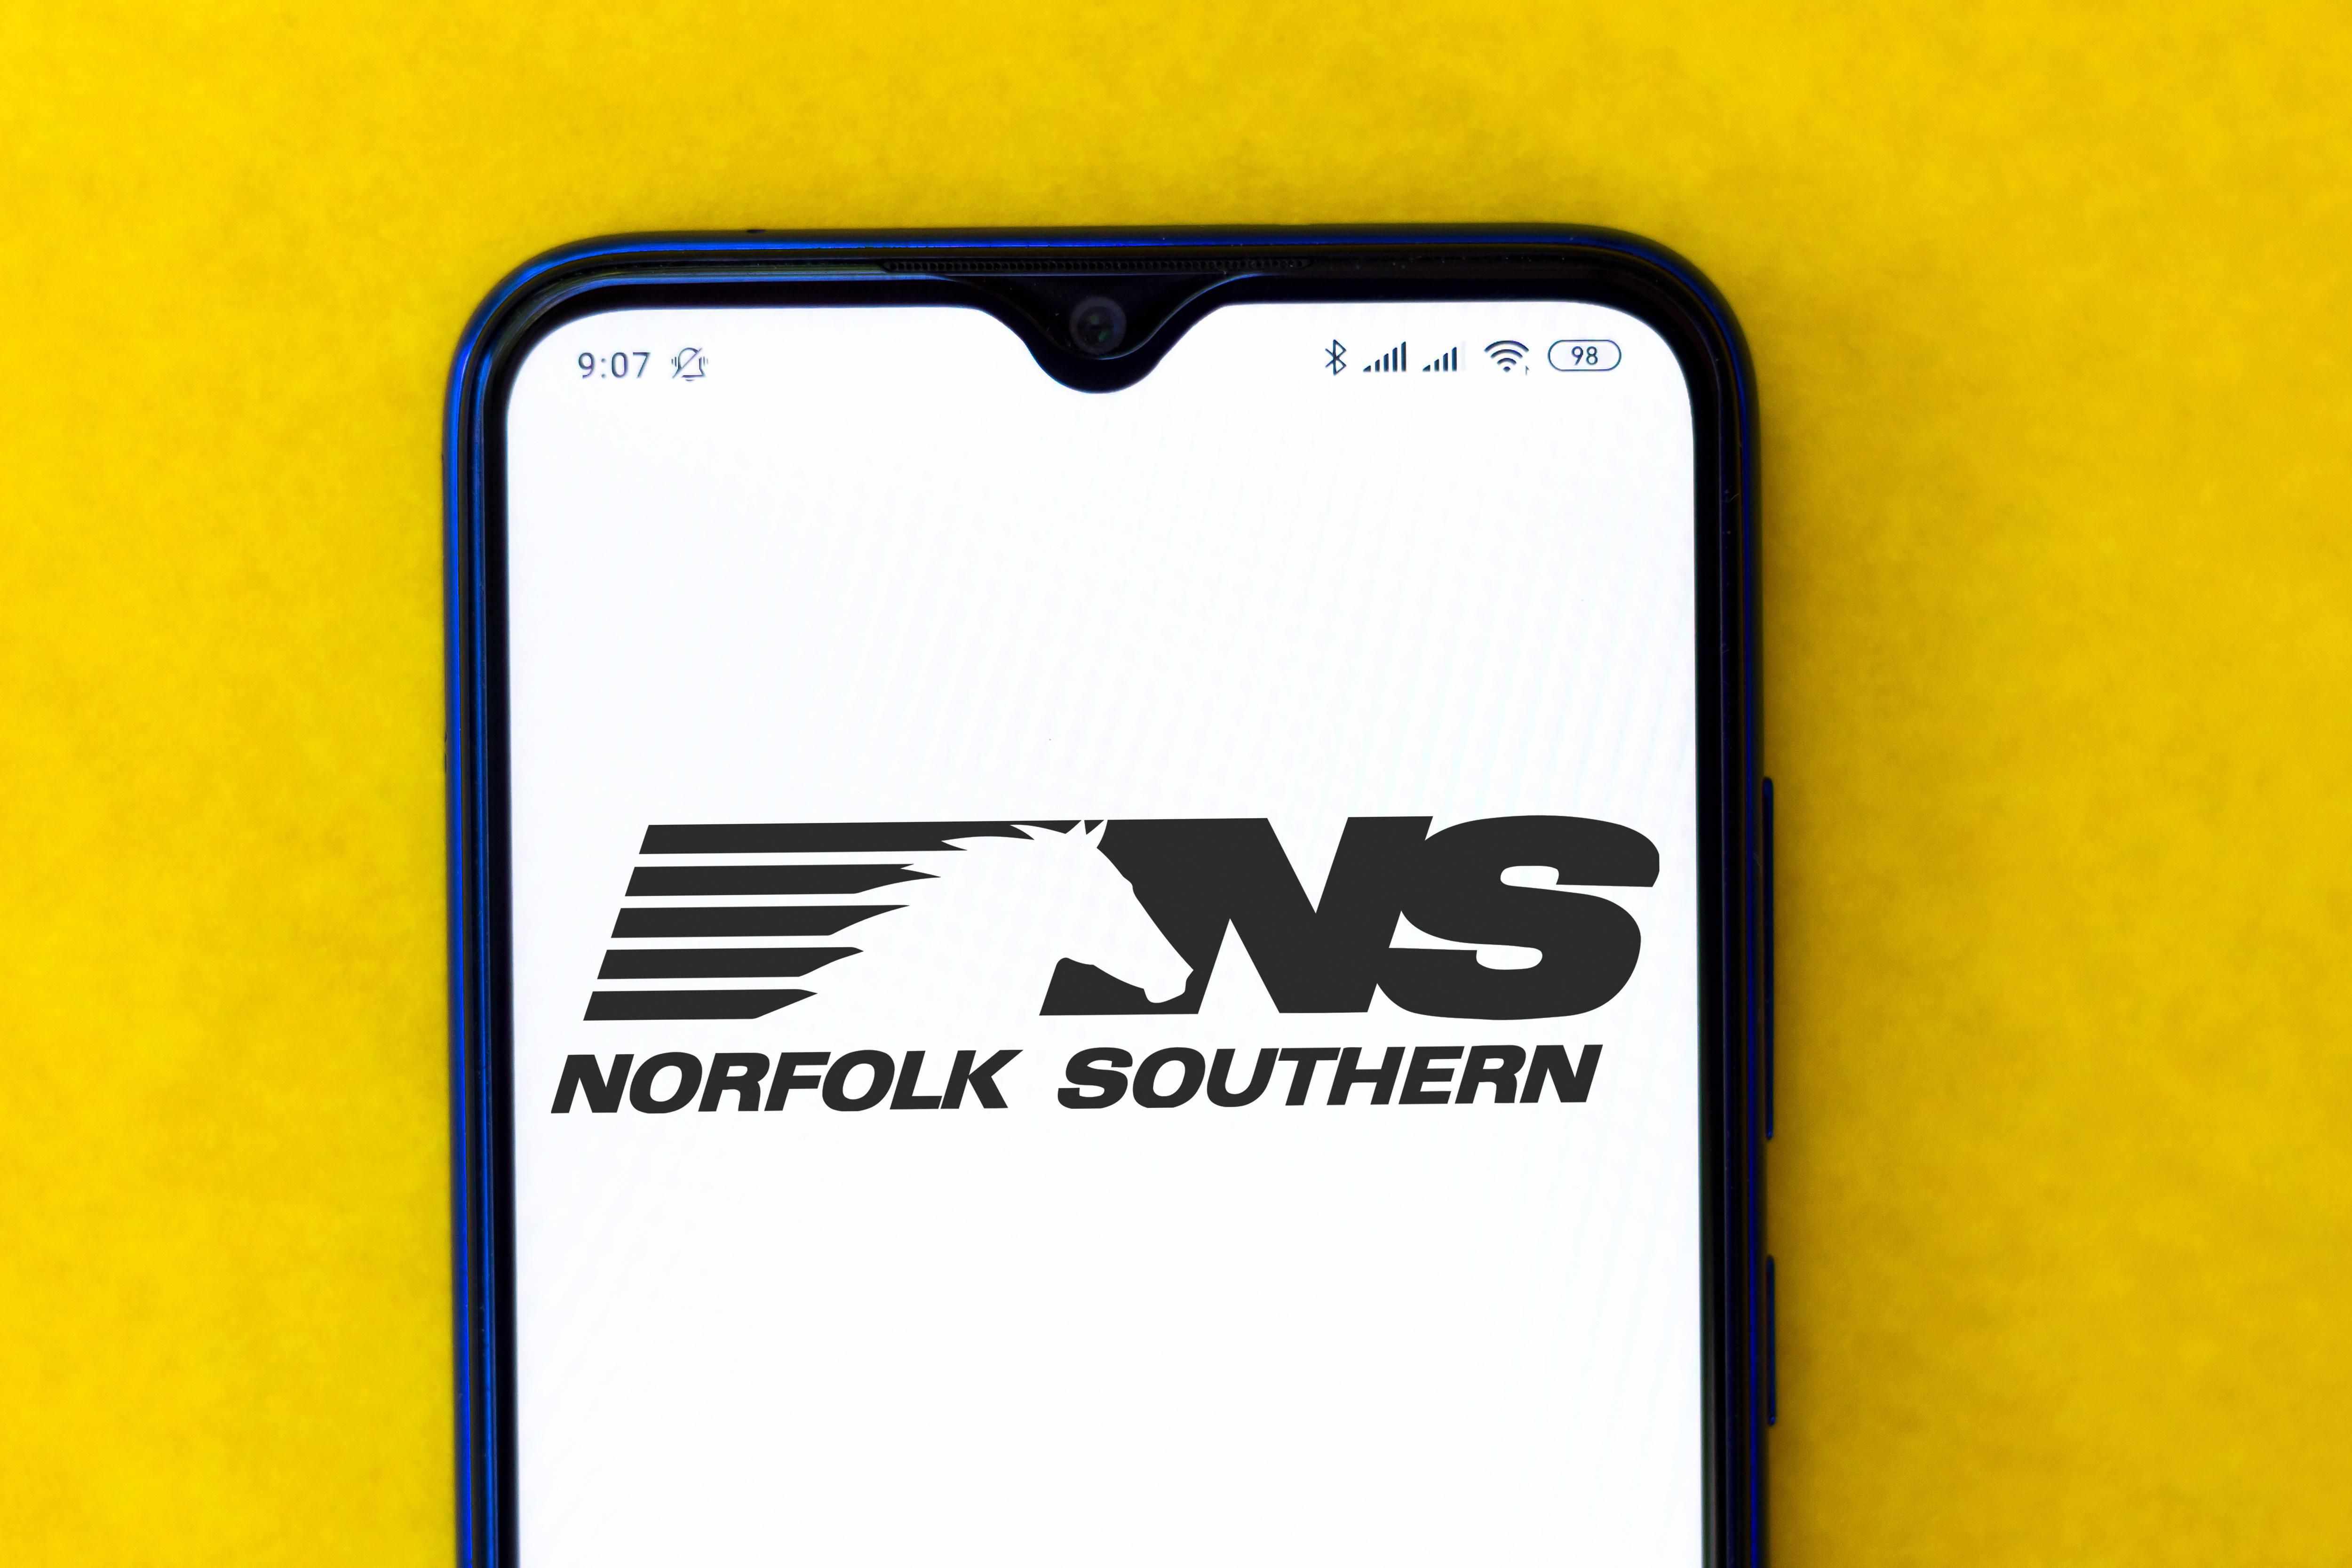 stock norfolk southern downside risk